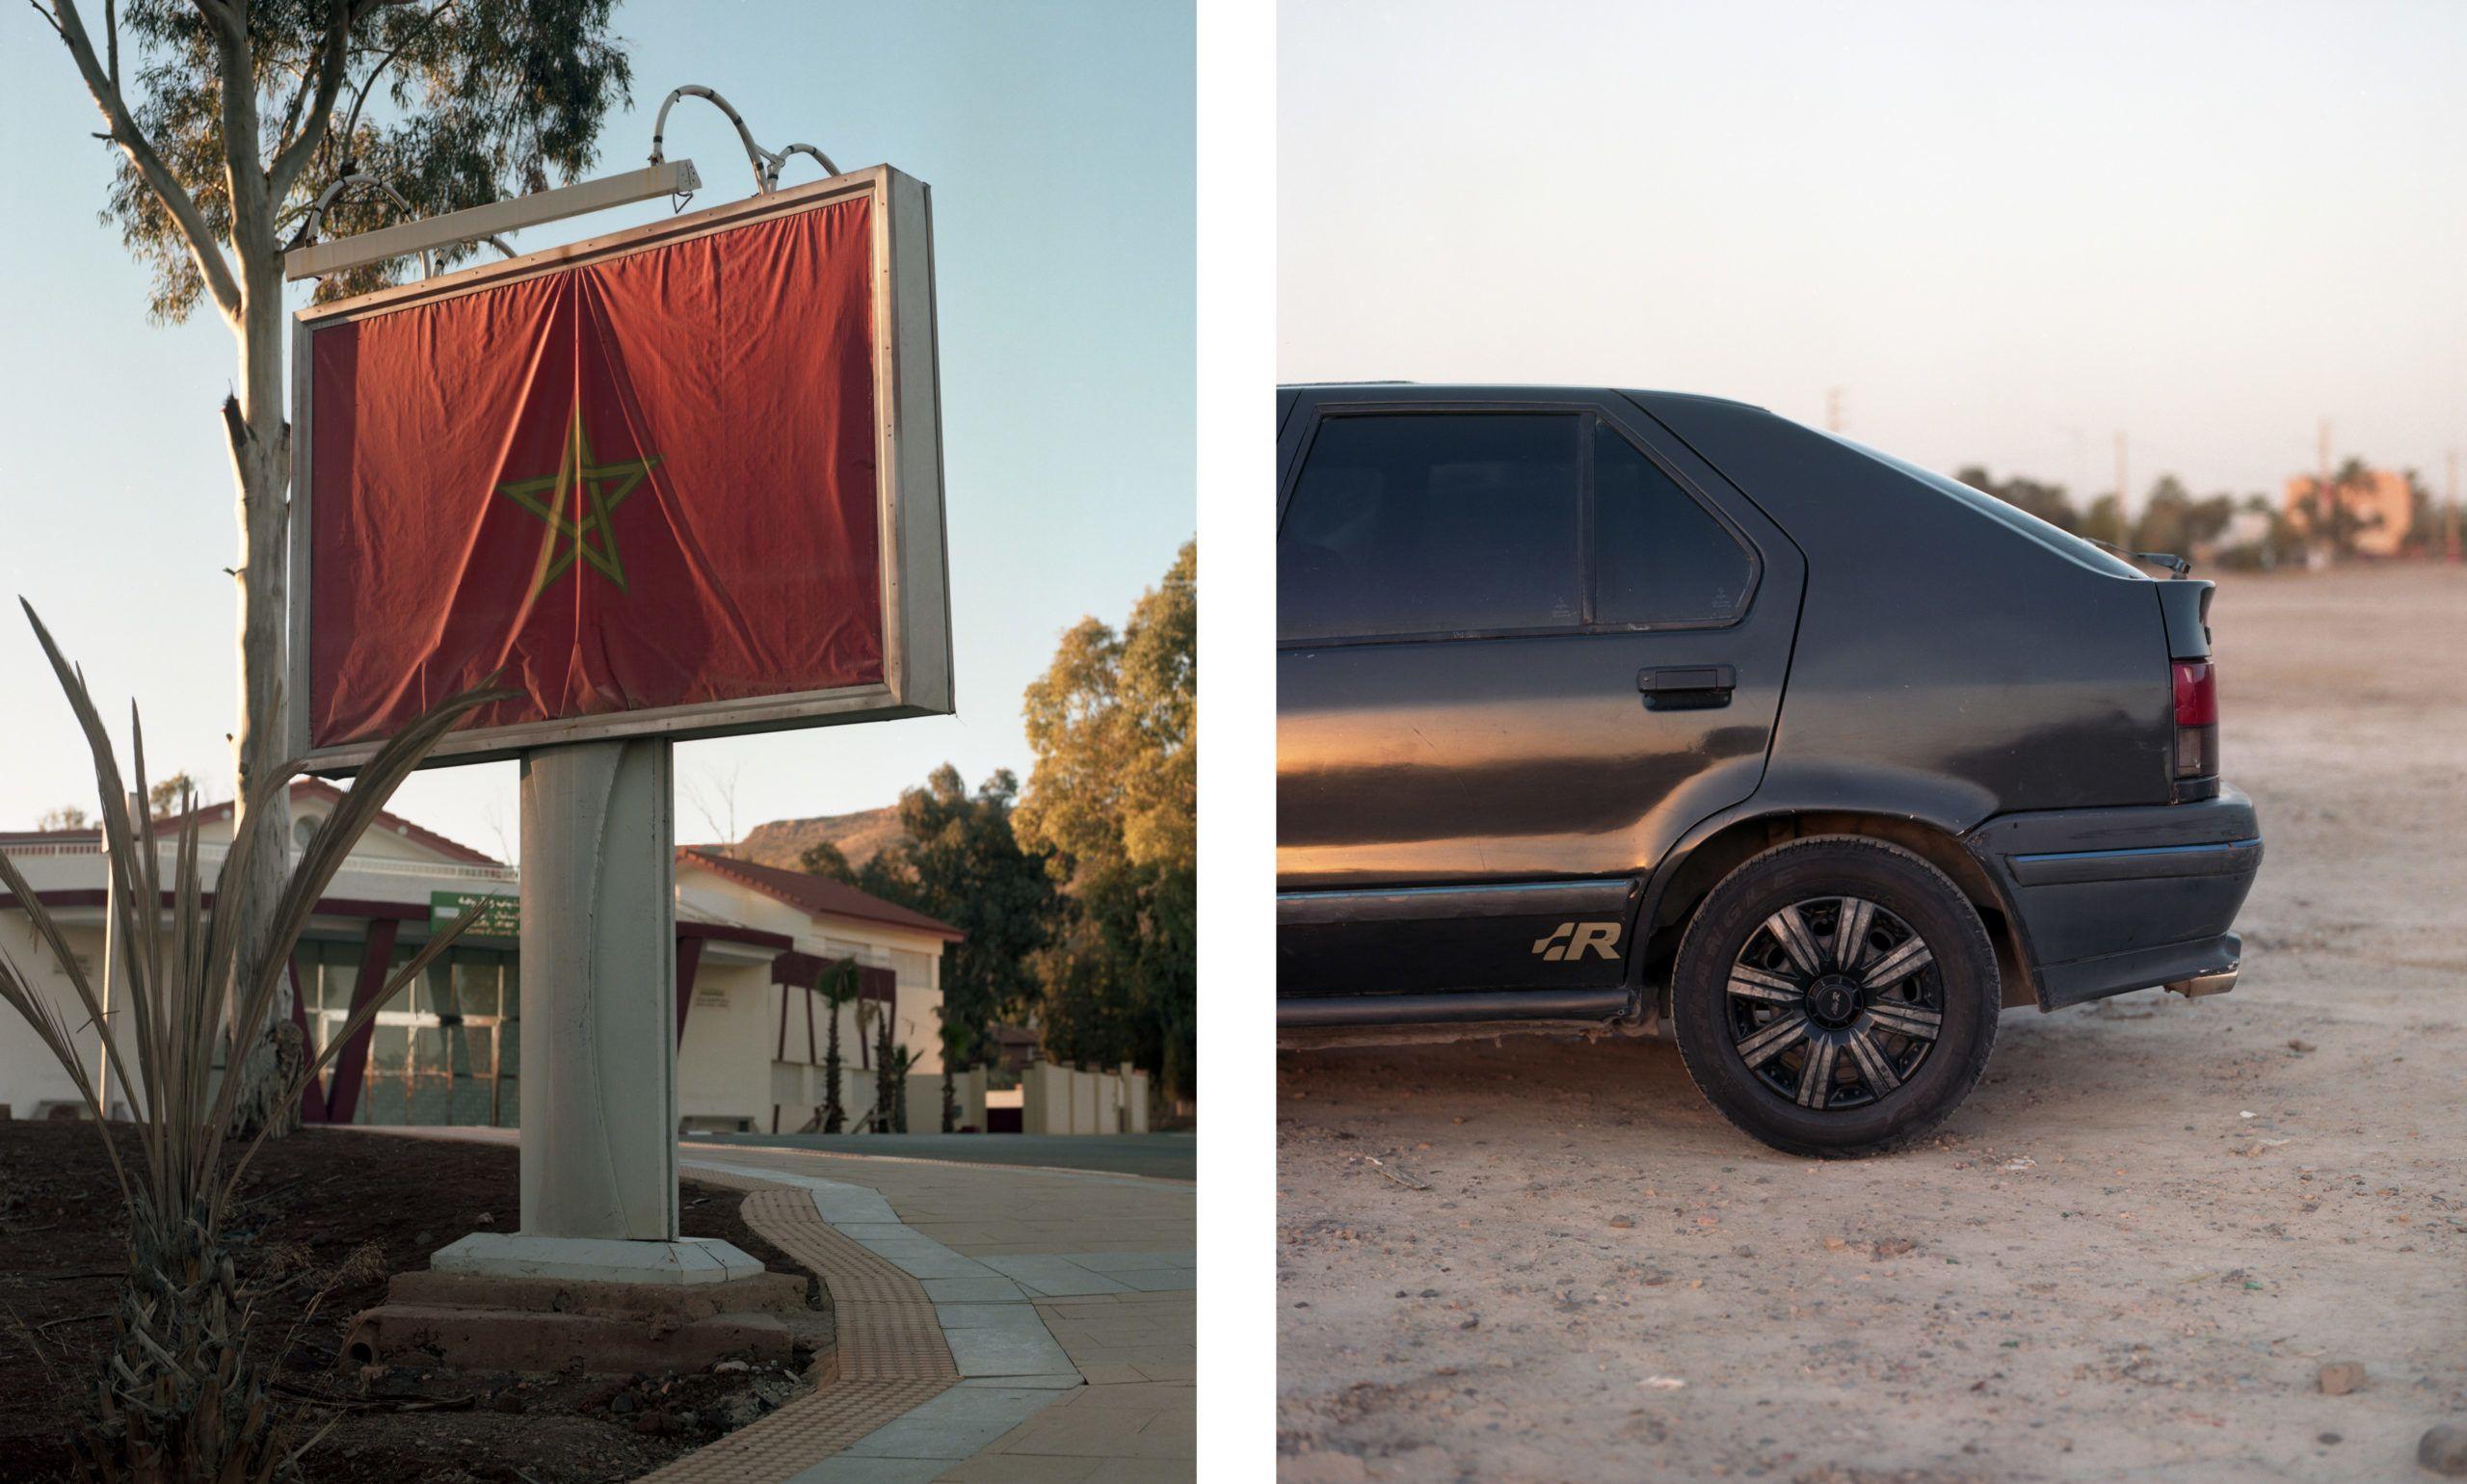 bidules-latest-journal Maroc-victor pattyn prends soin de toi